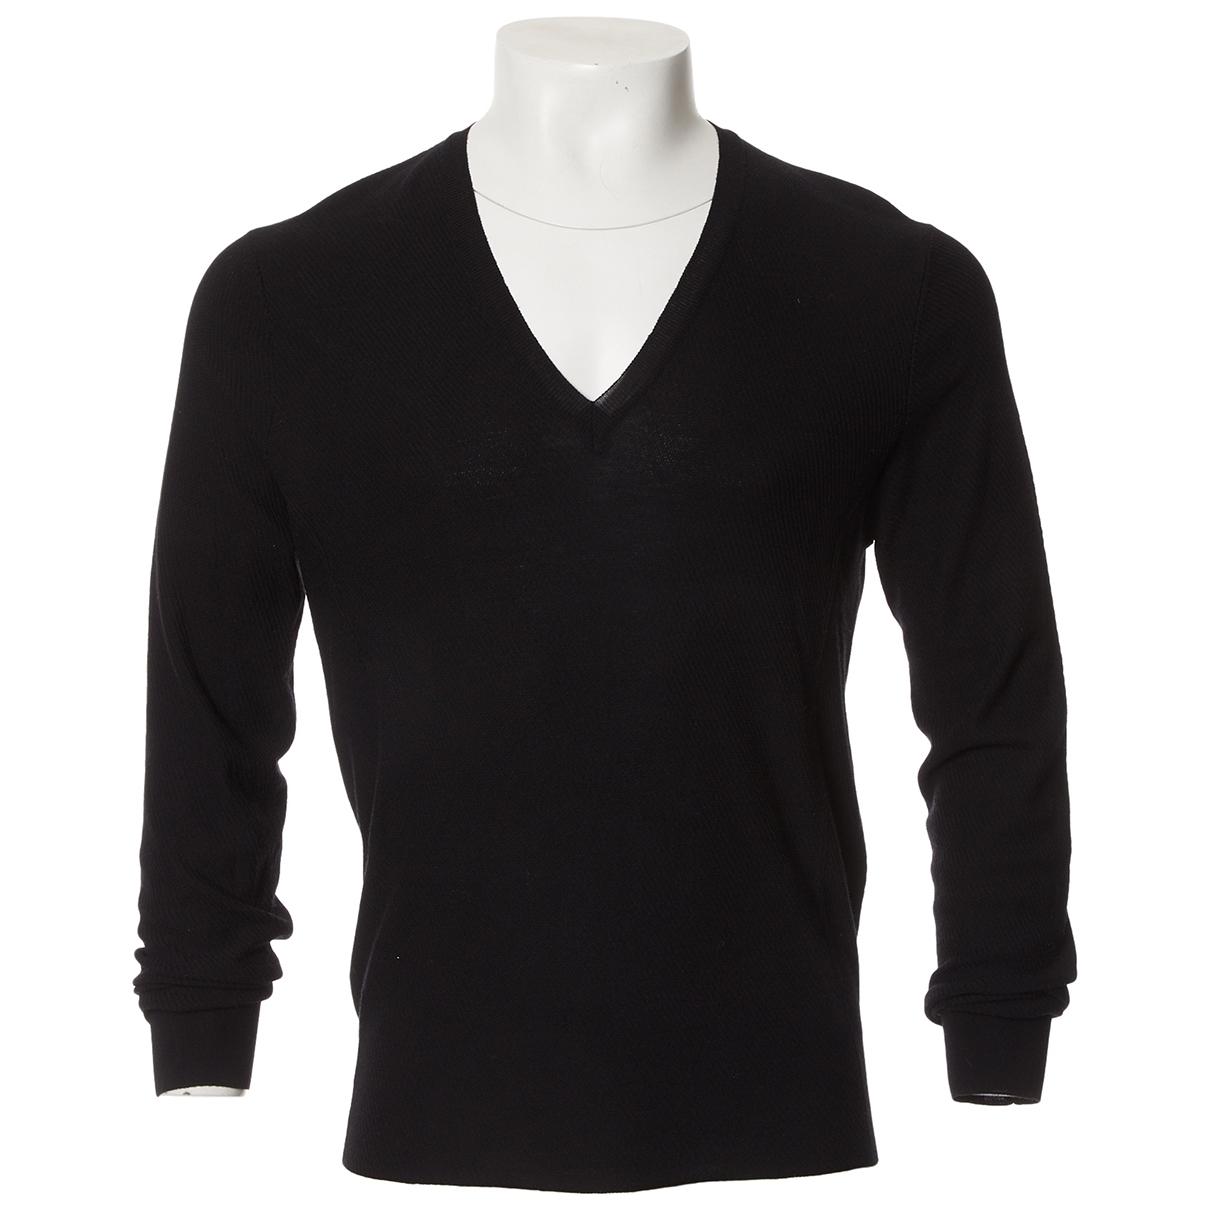 Yves Saint Laurent \N Black Wool Knitwear & Sweatshirts for Men L International